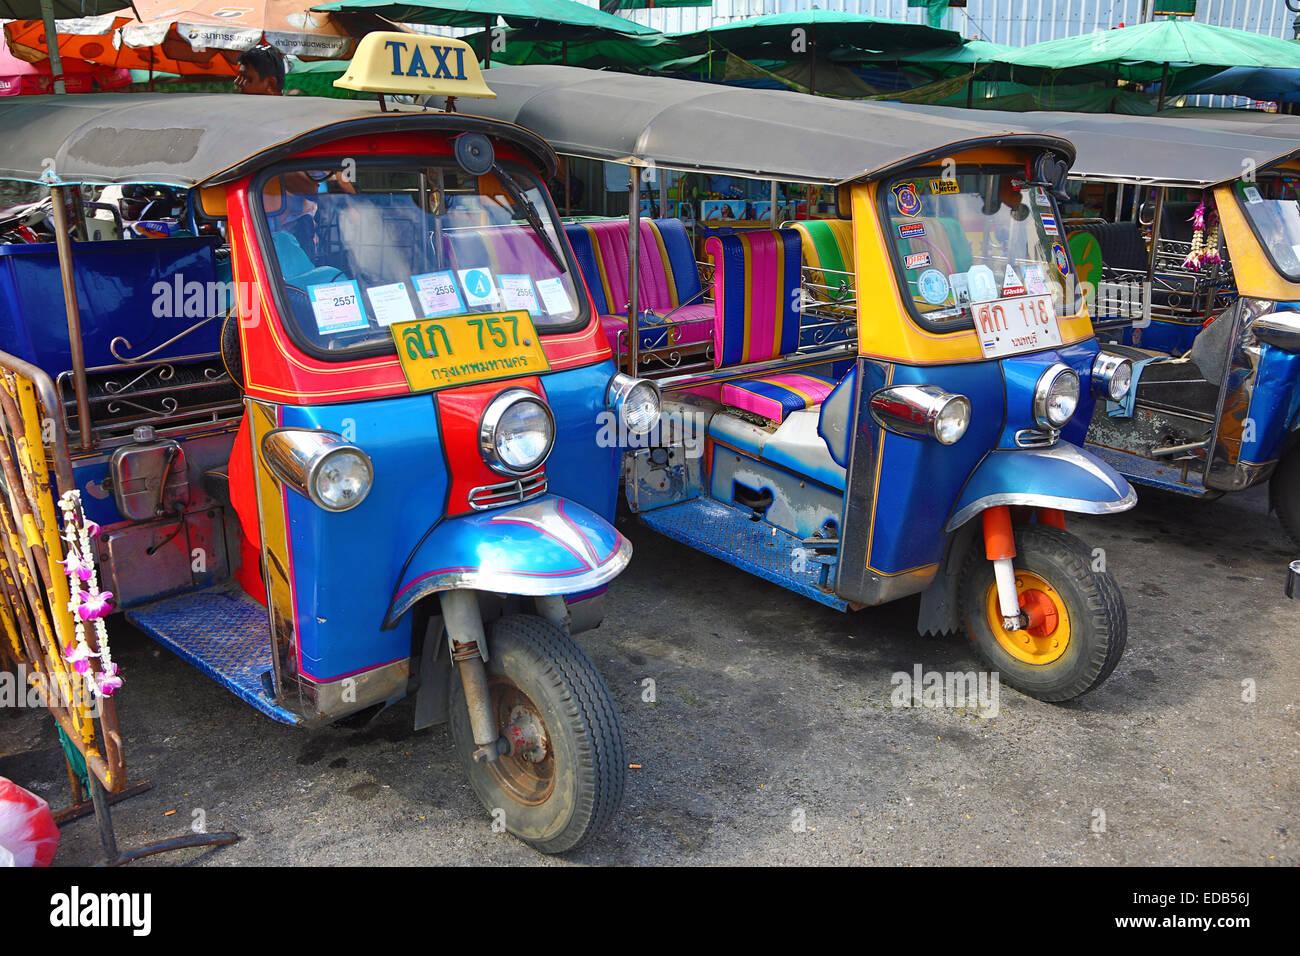 traditional tuk tuk taxi transport in bangkok thailand stock photo royalty free image. Black Bedroom Furniture Sets. Home Design Ideas